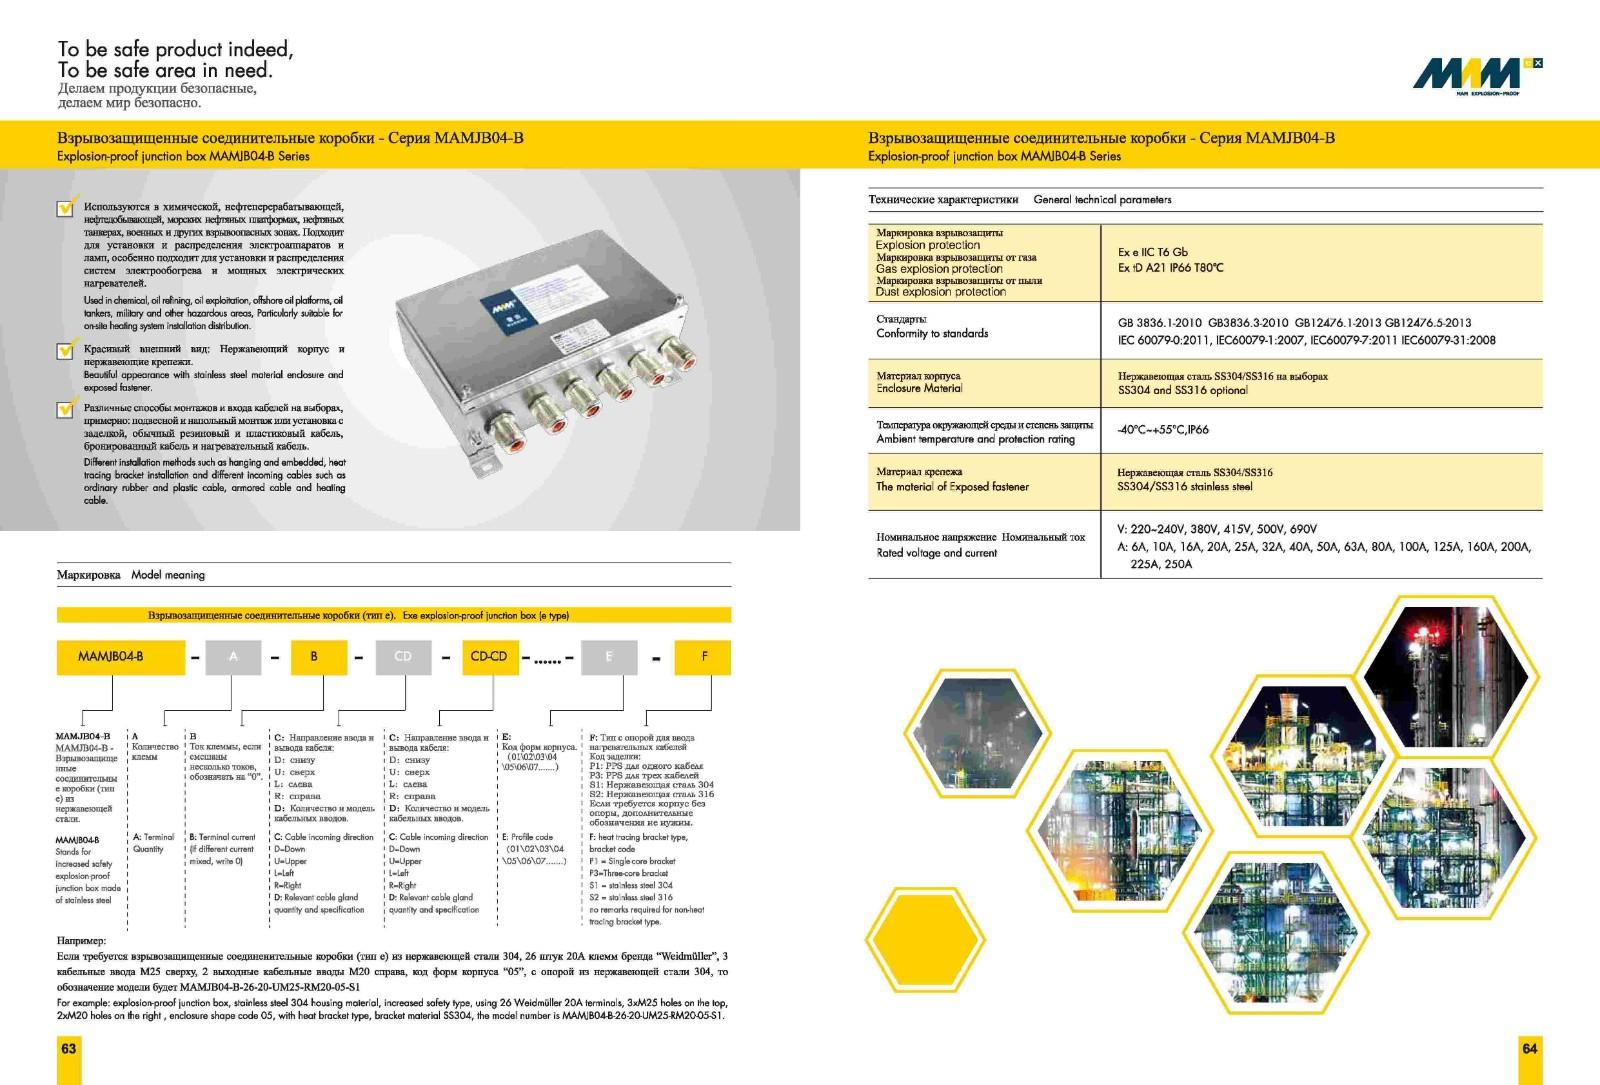 Explosion-proof terminal box MAMJB04-G/Q